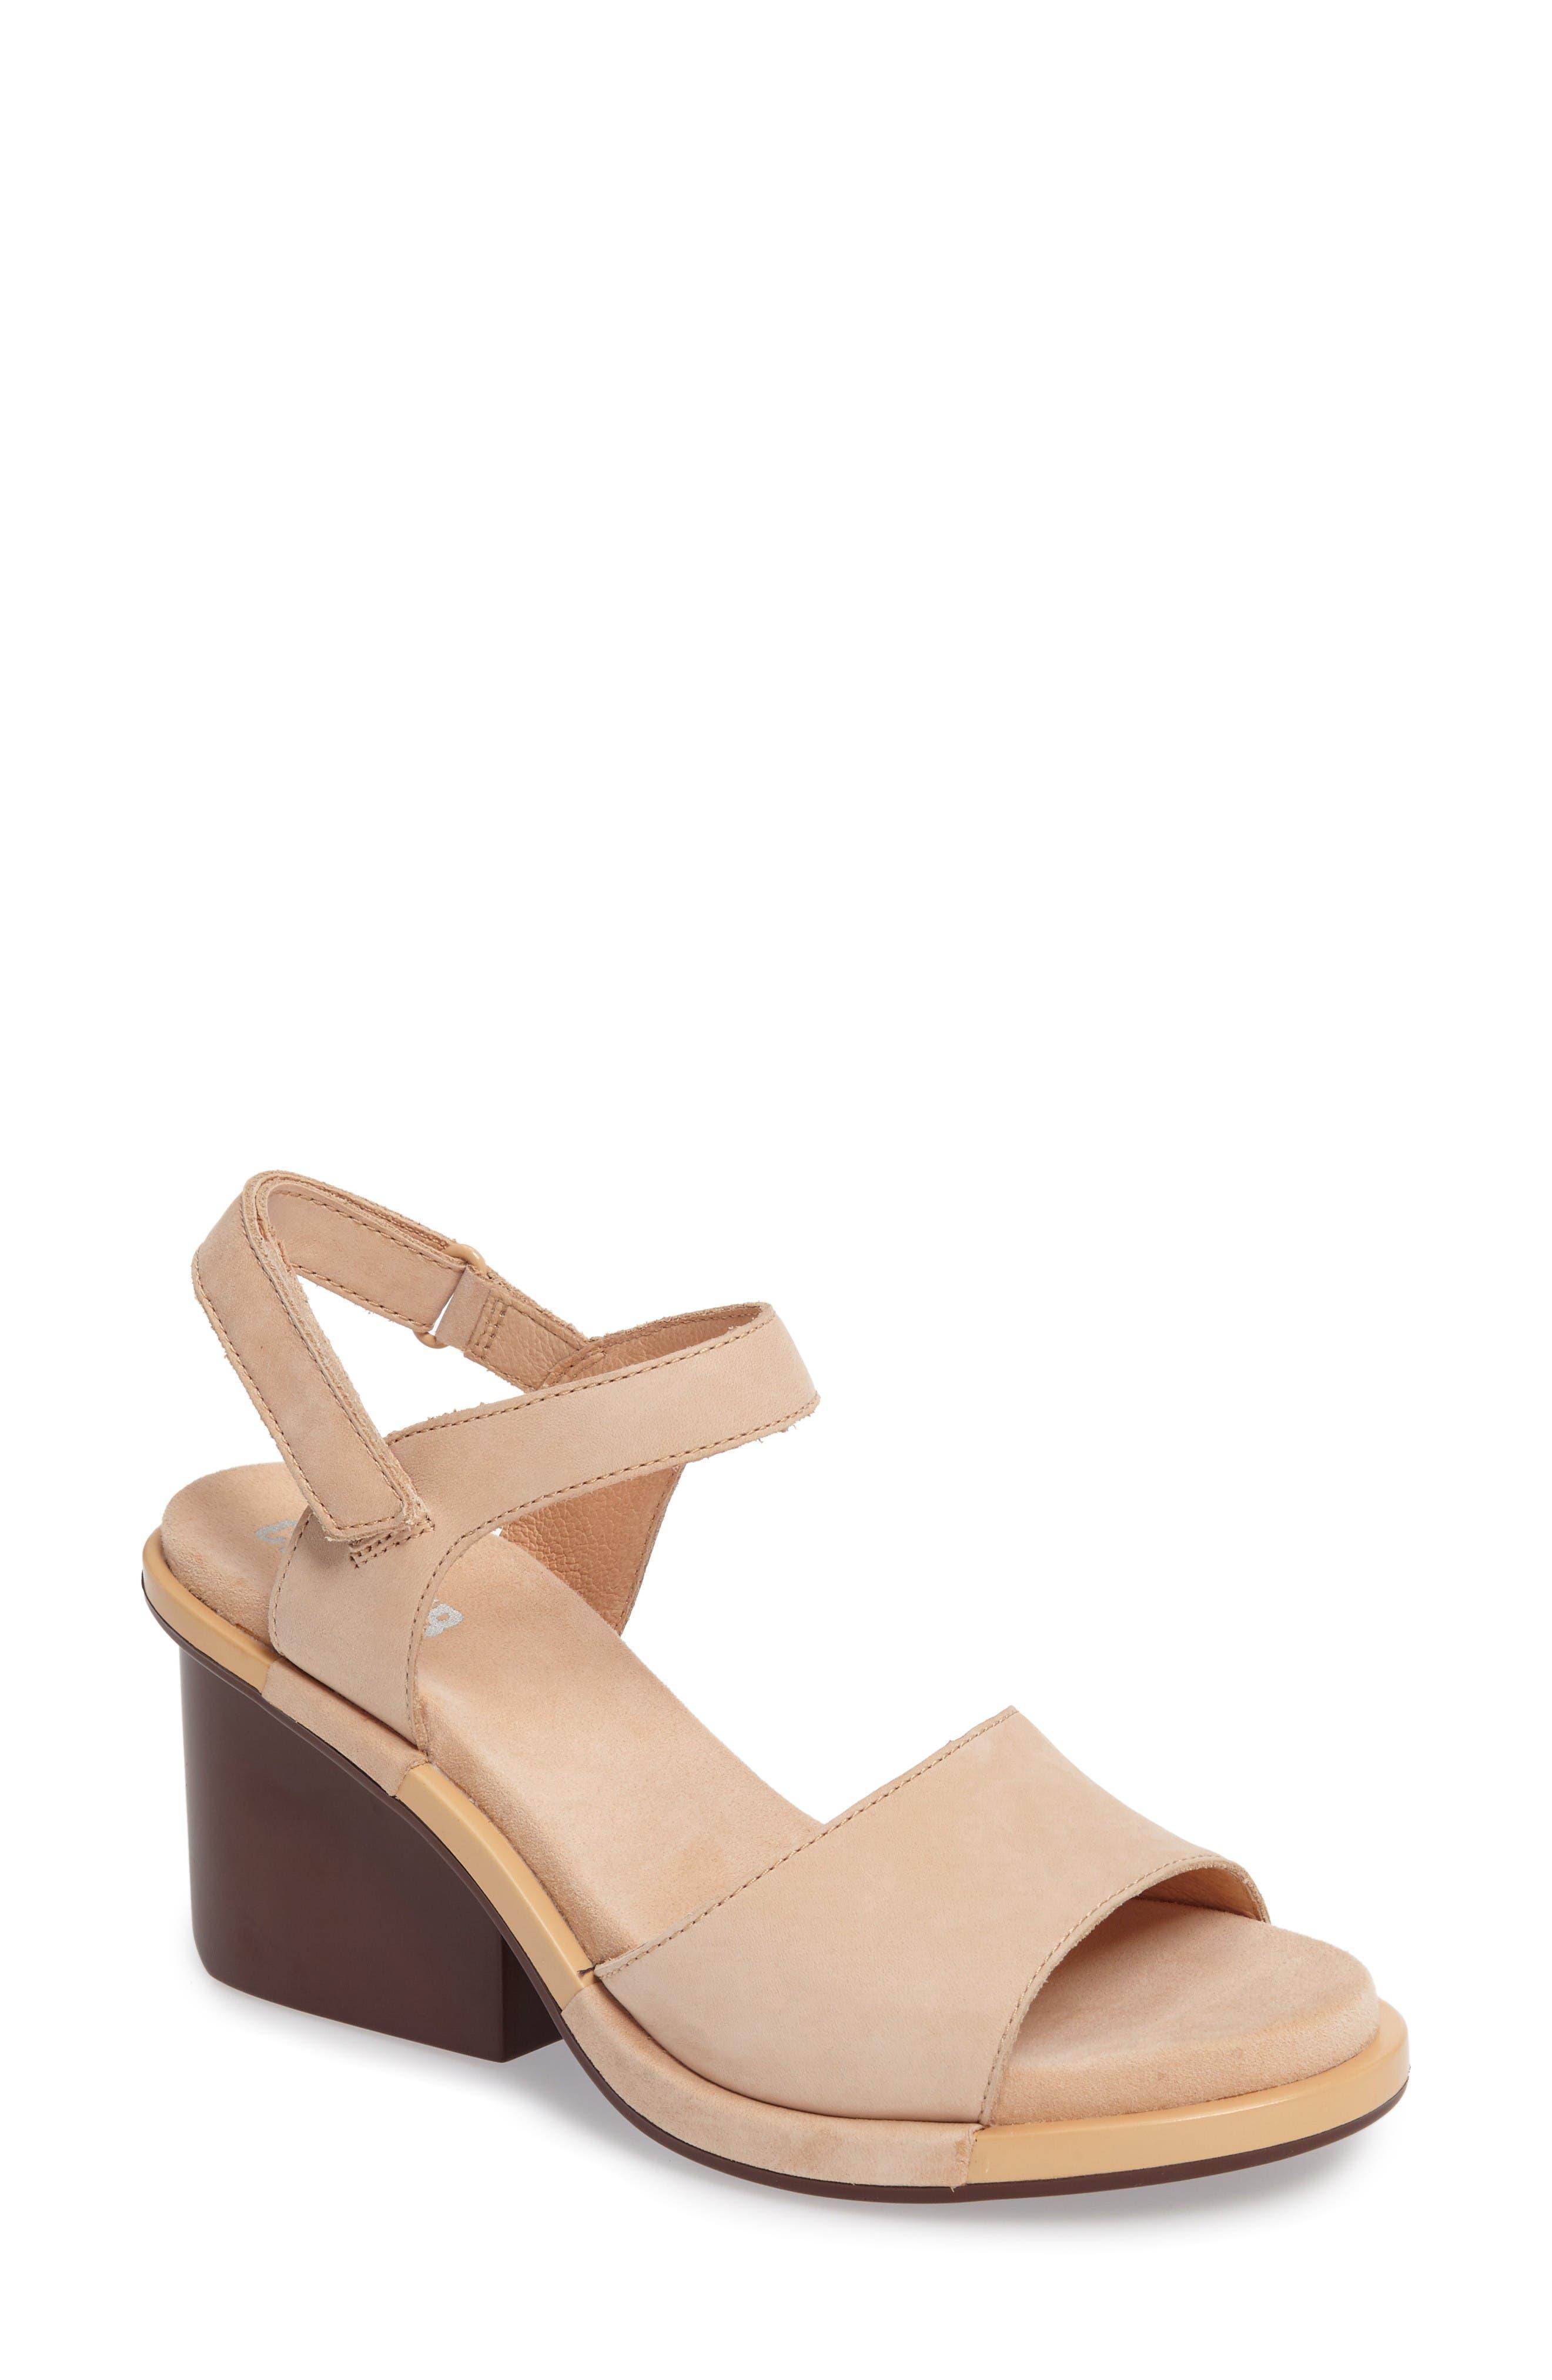 Ivy Ankle Strap Sandal,                         Main,                         color, Beige Leather